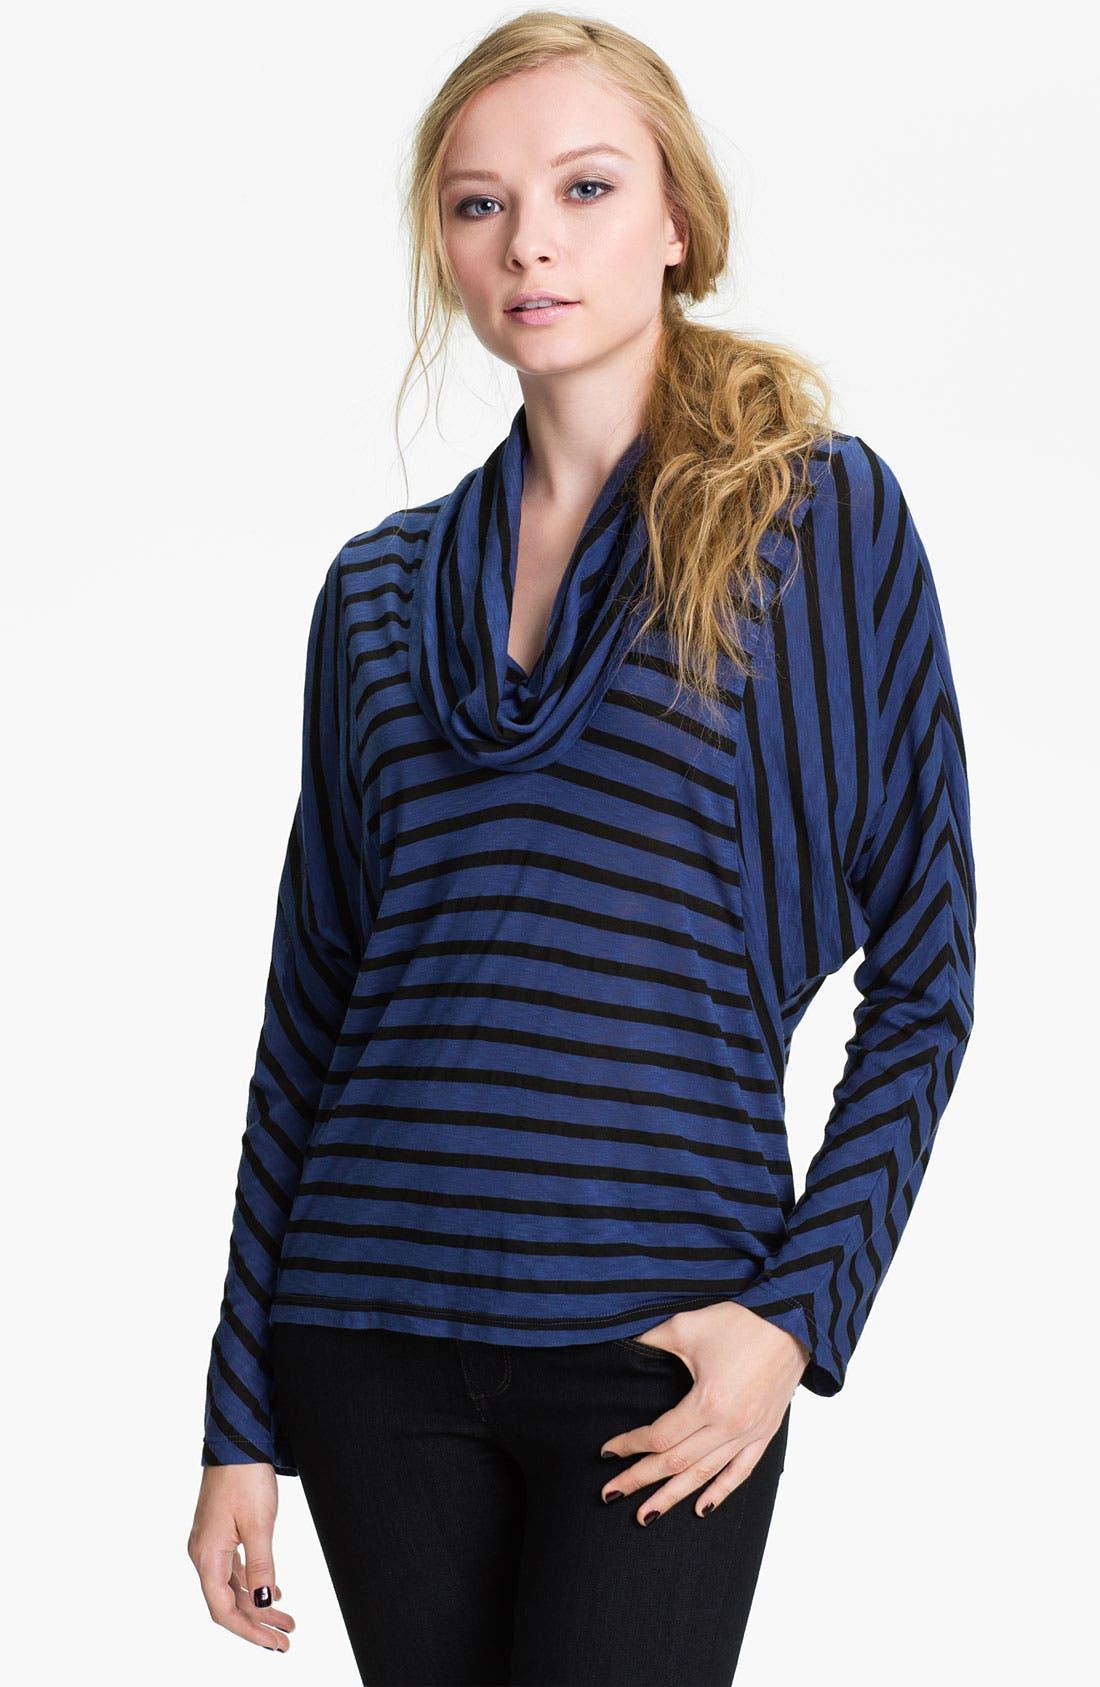 Alternate Image 1 Selected - Splendid 'Venice' Stripe Cowl Neck Top